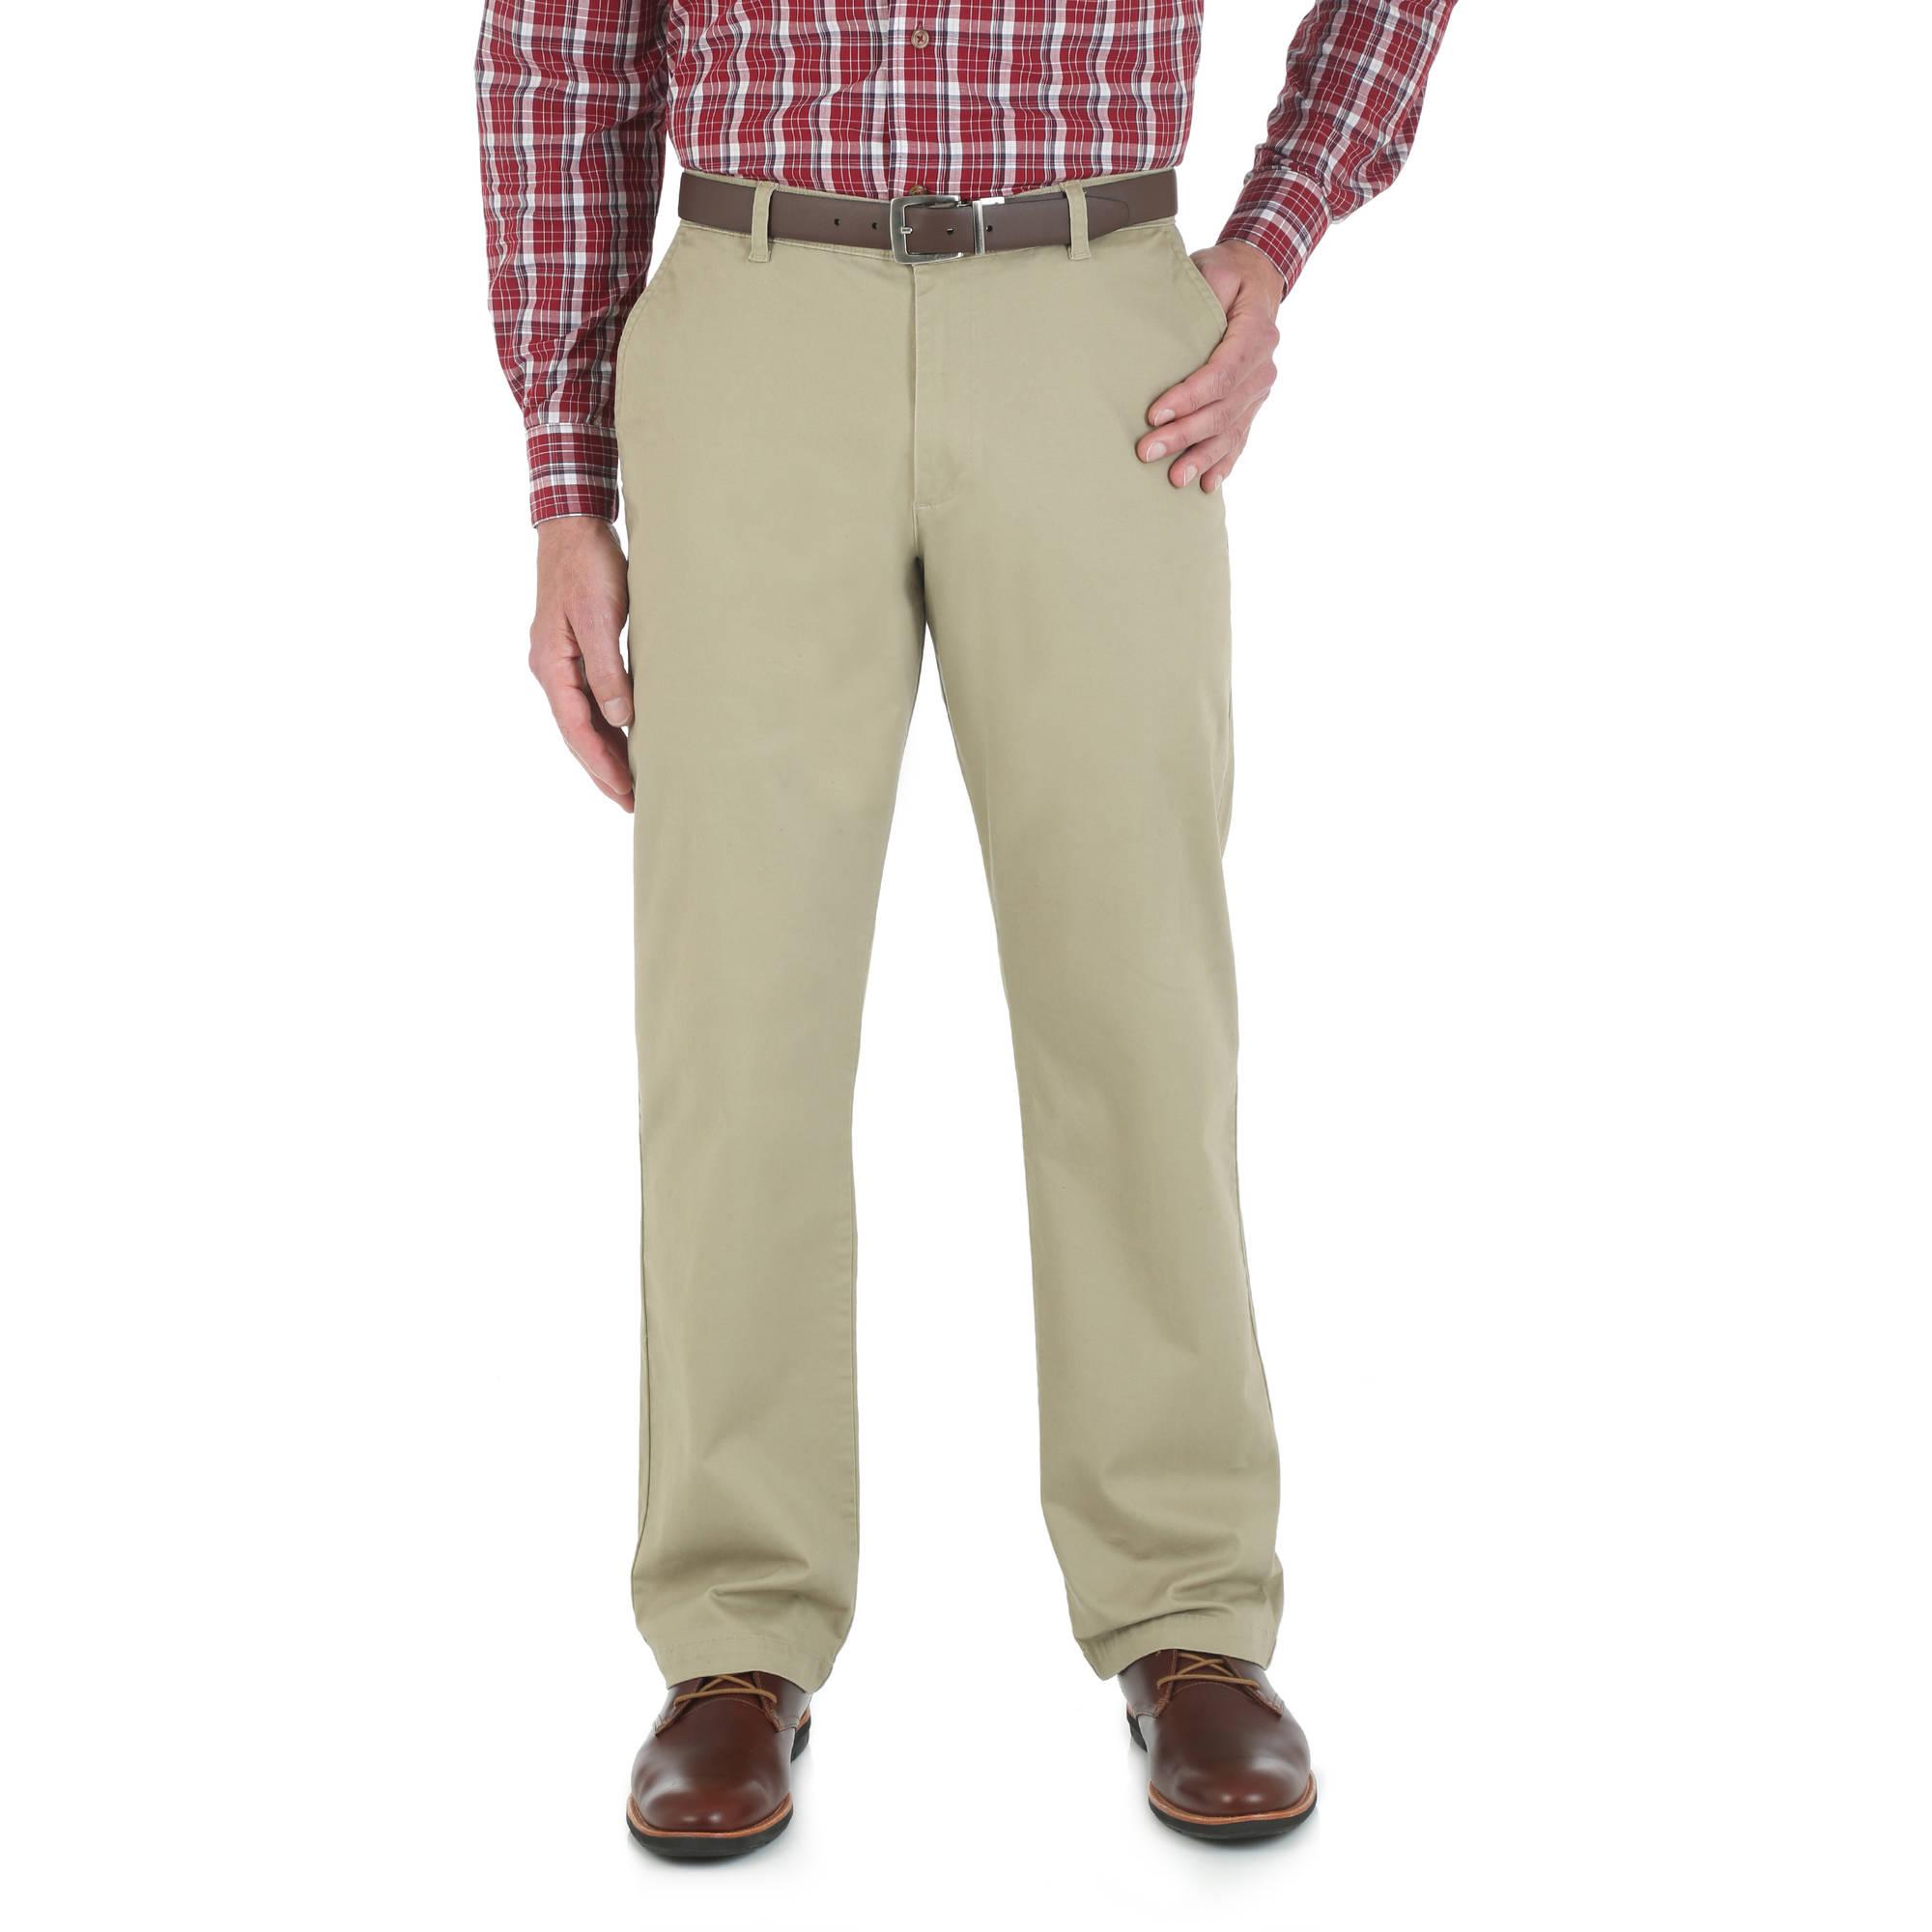 Wrangler Men's Advanced Comfort Performance 4Way Flex Pant